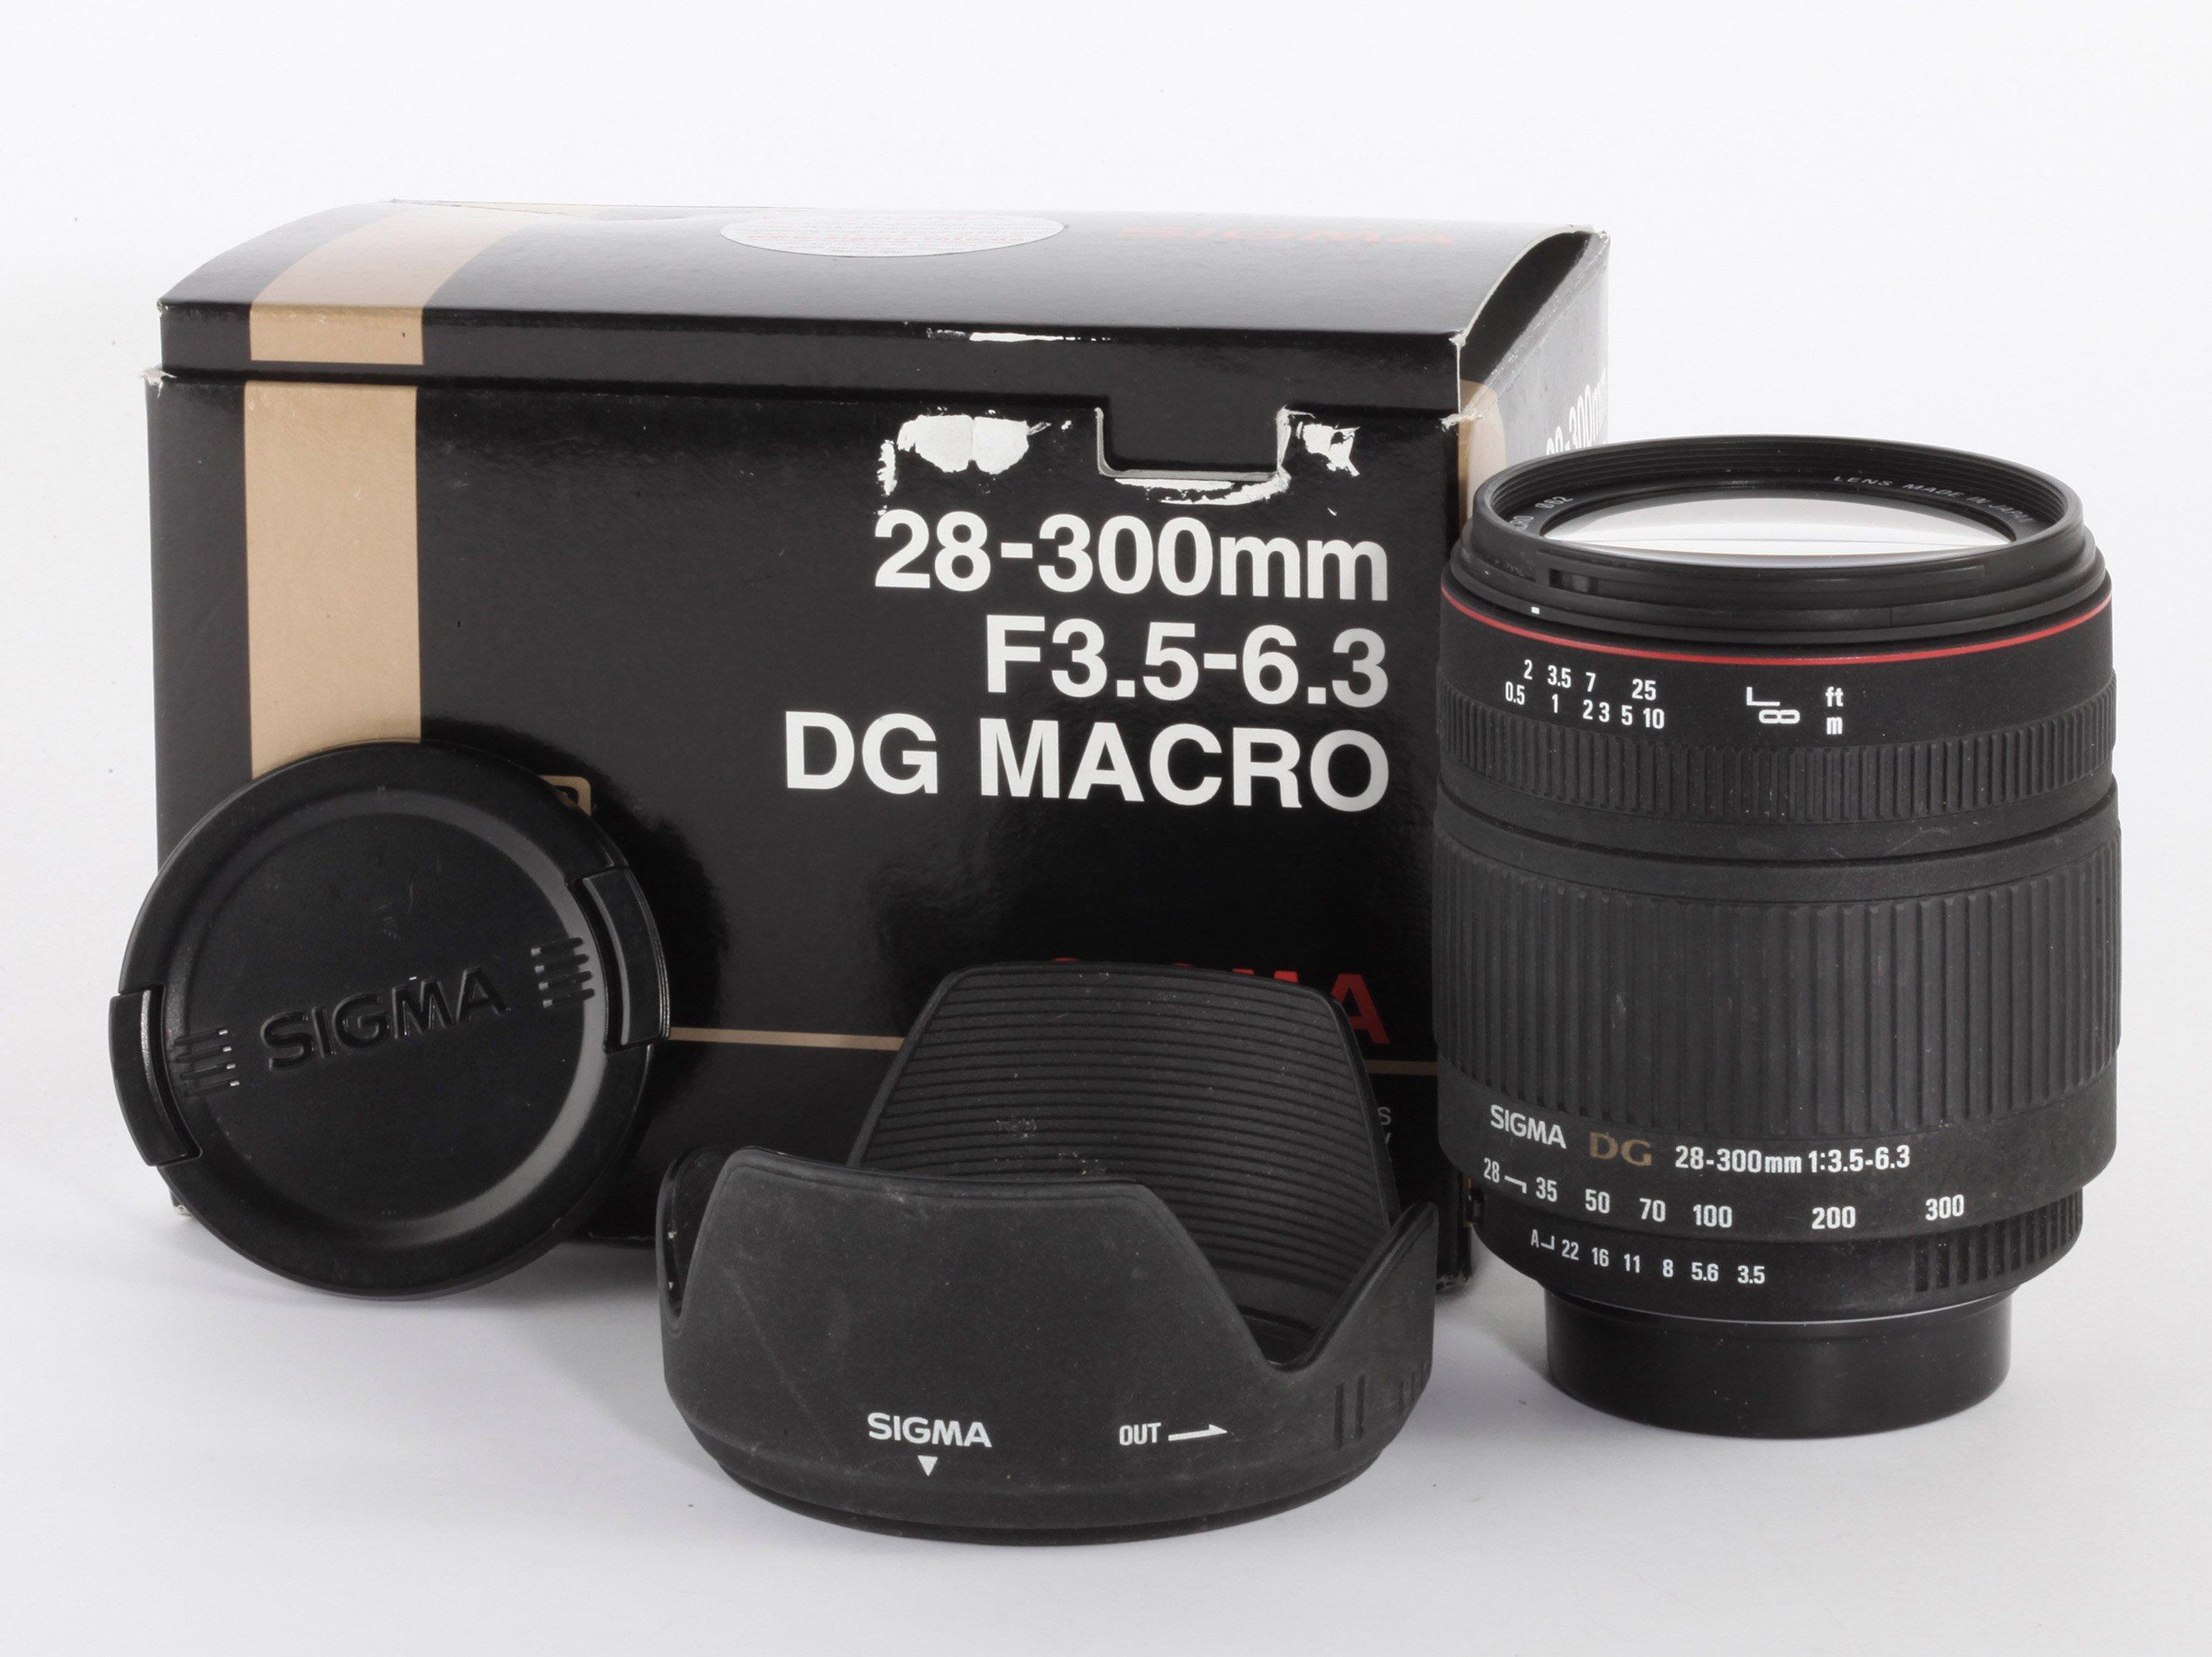 Sigma DG 28-300mm 3,5-6,3 f.Pentax